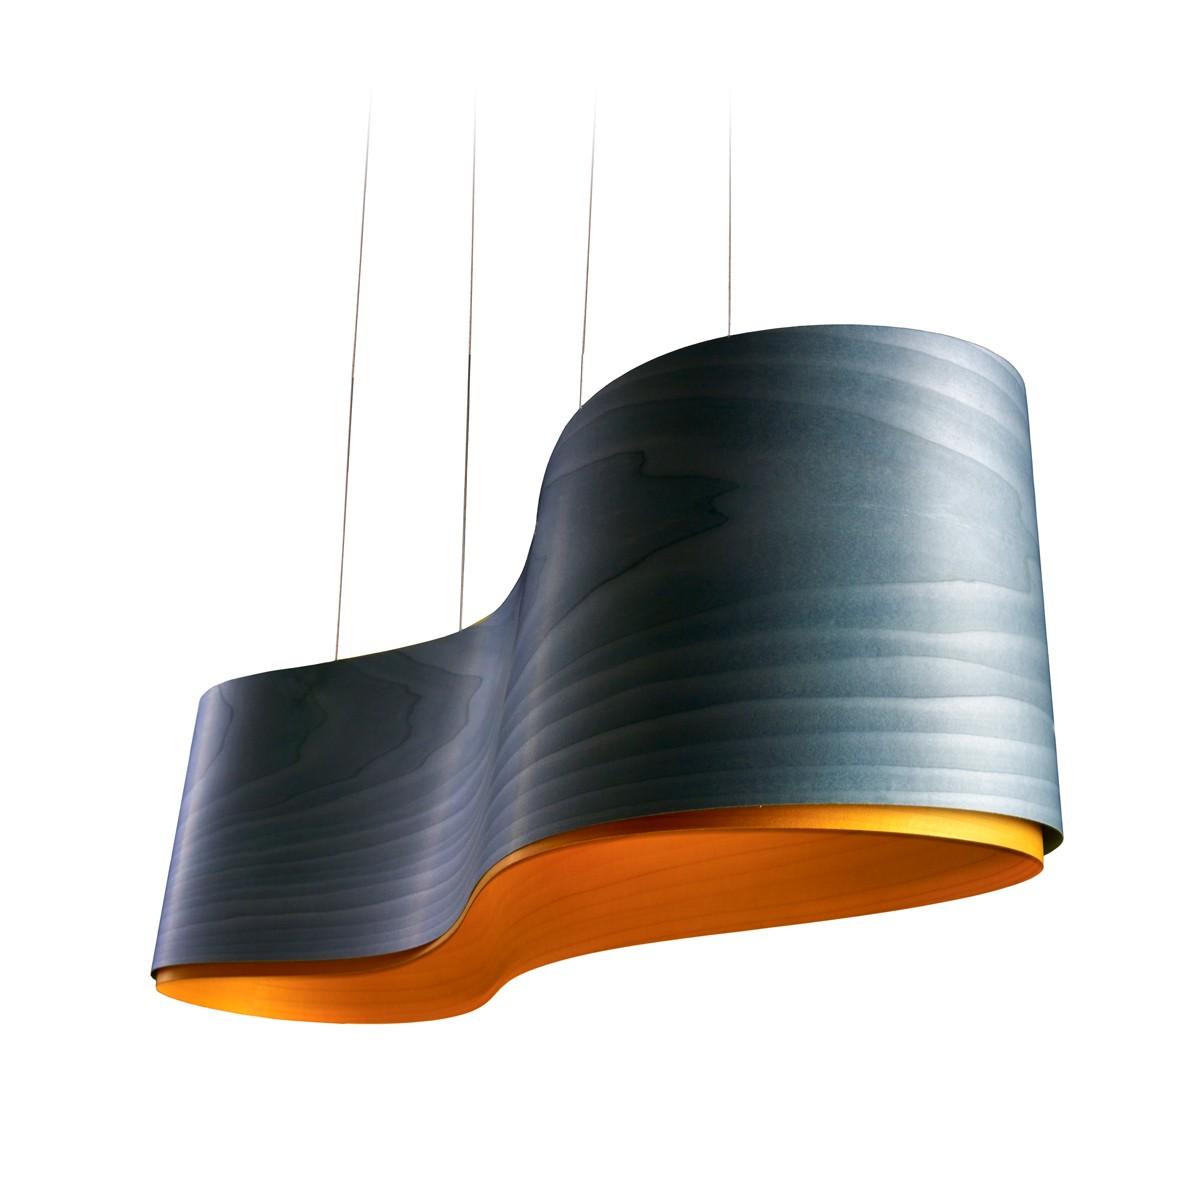 LZF Lamps New Wave LED Pendelleuchte, blau, innen: gelb